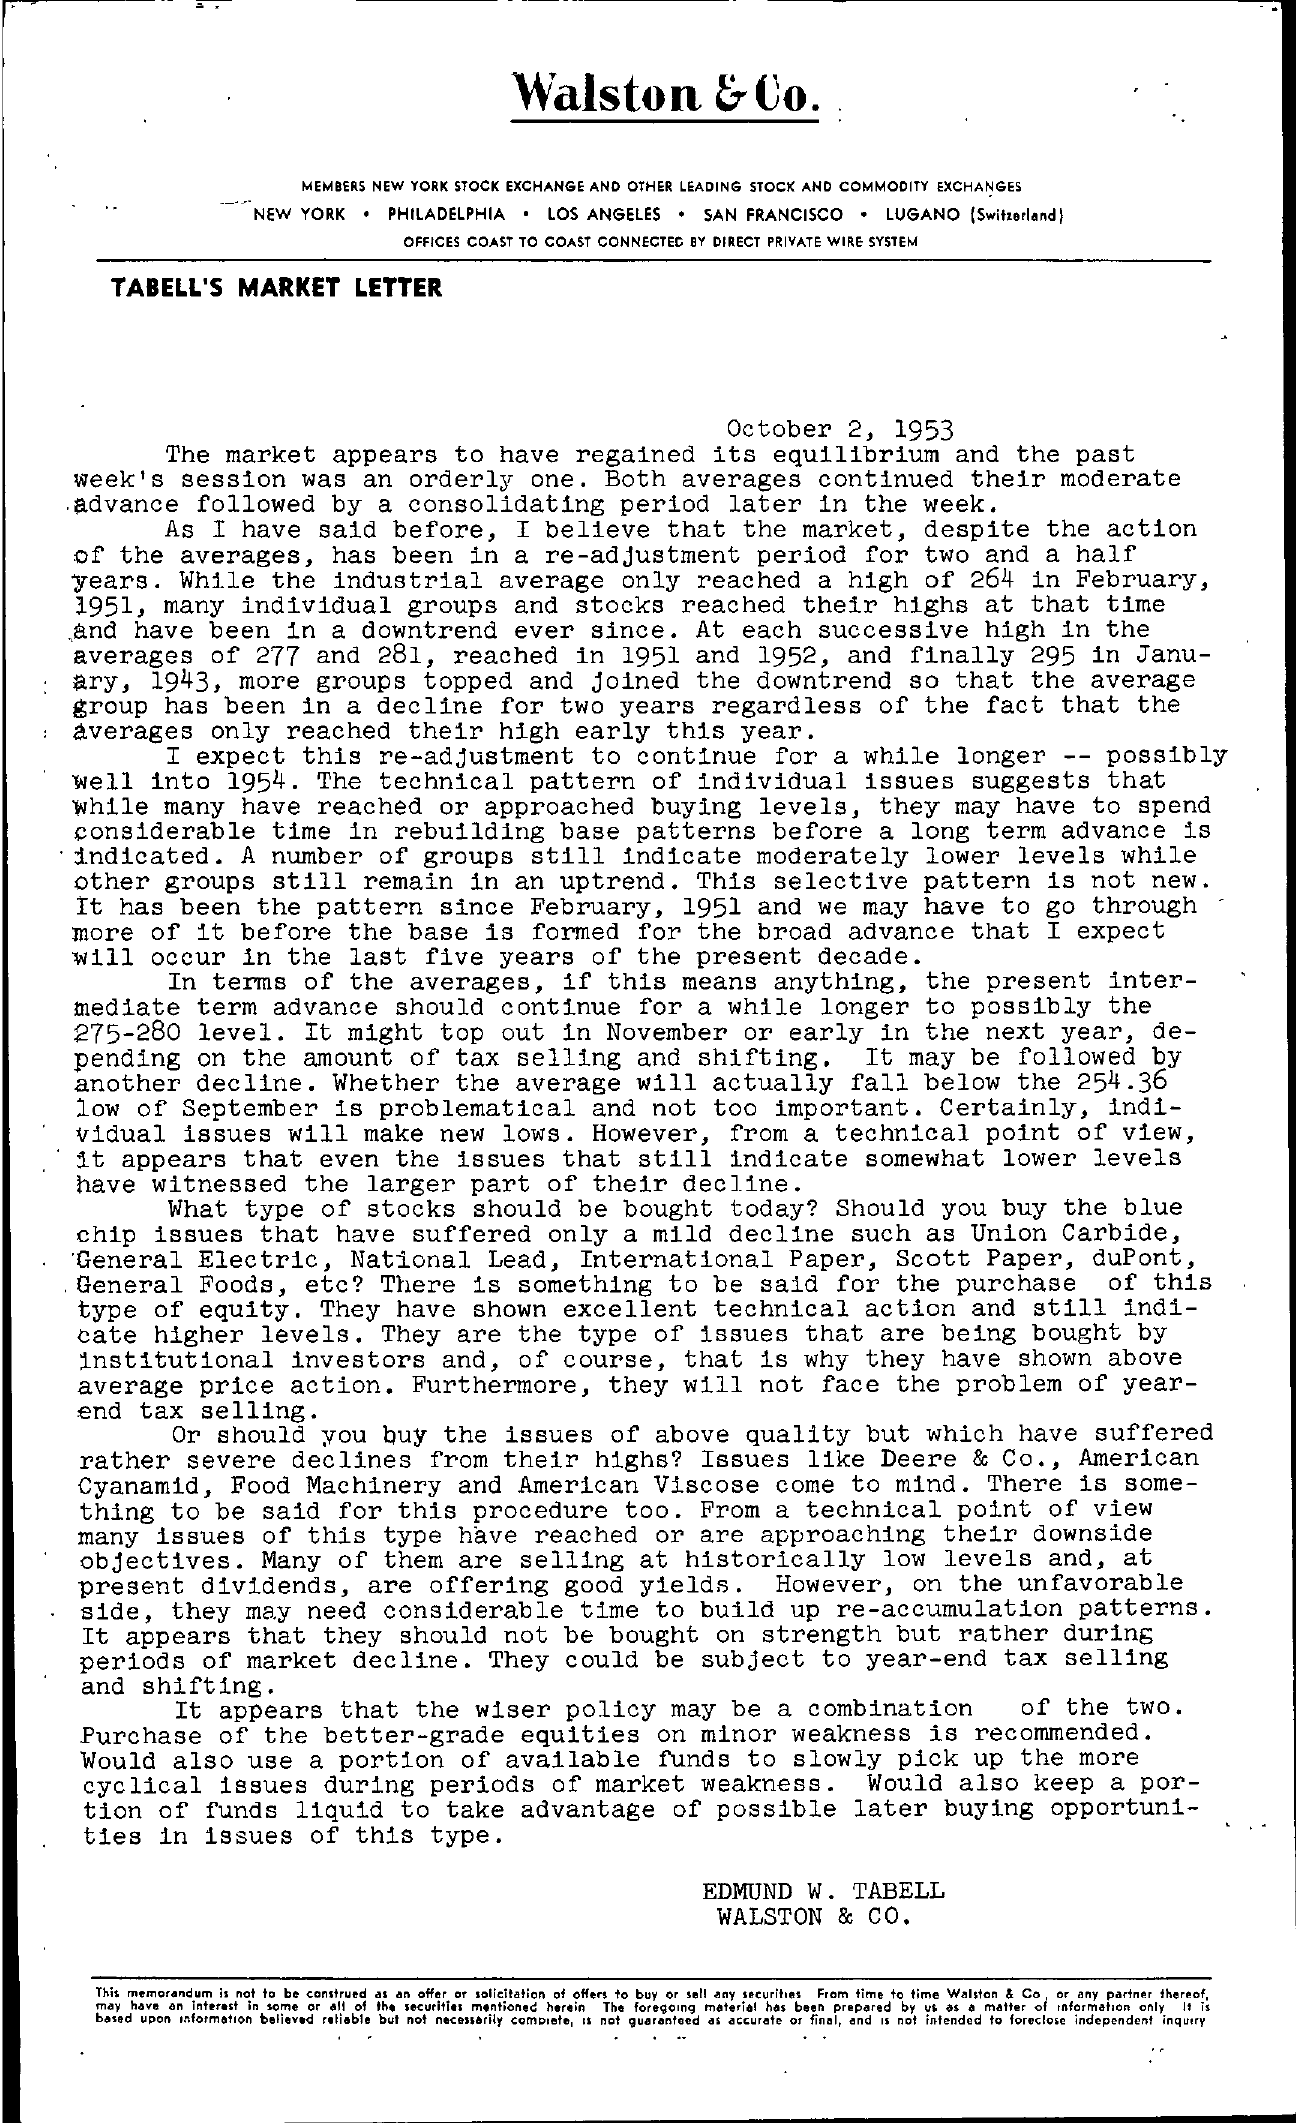 Tabell's Market Letter - October 02, 1953